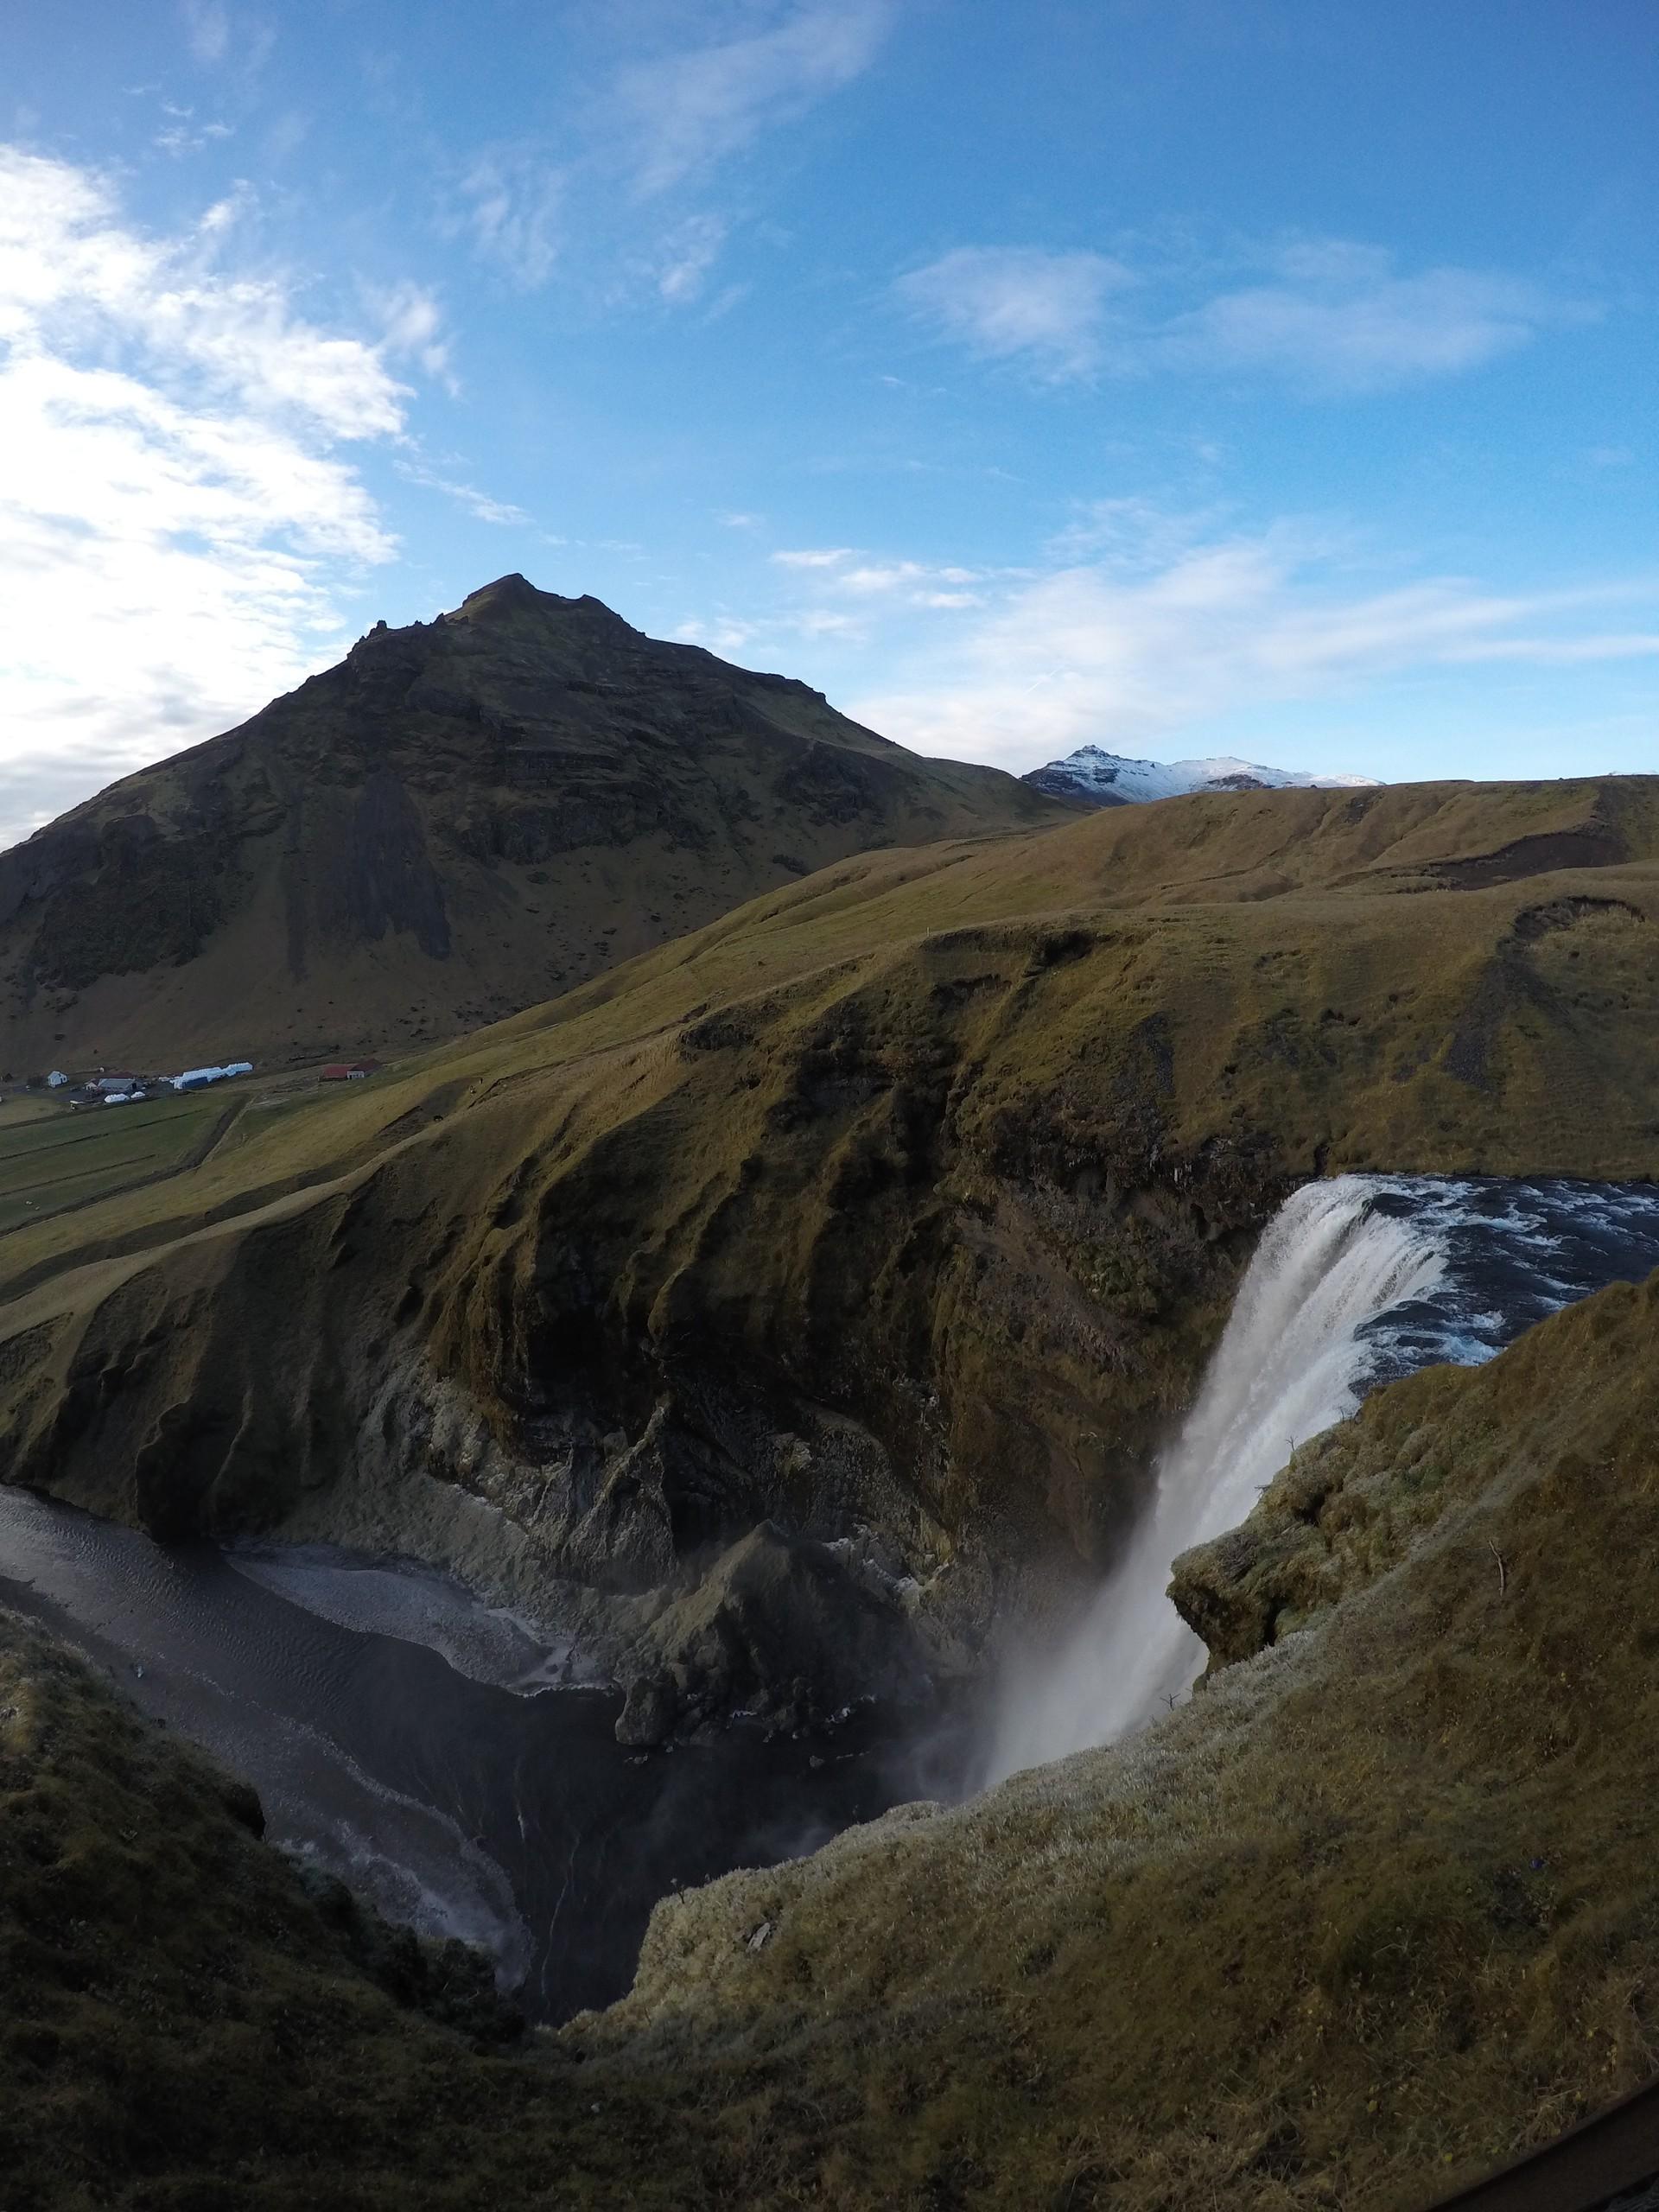 Expérience Erasmus à Reykjavik, Islande par Belén